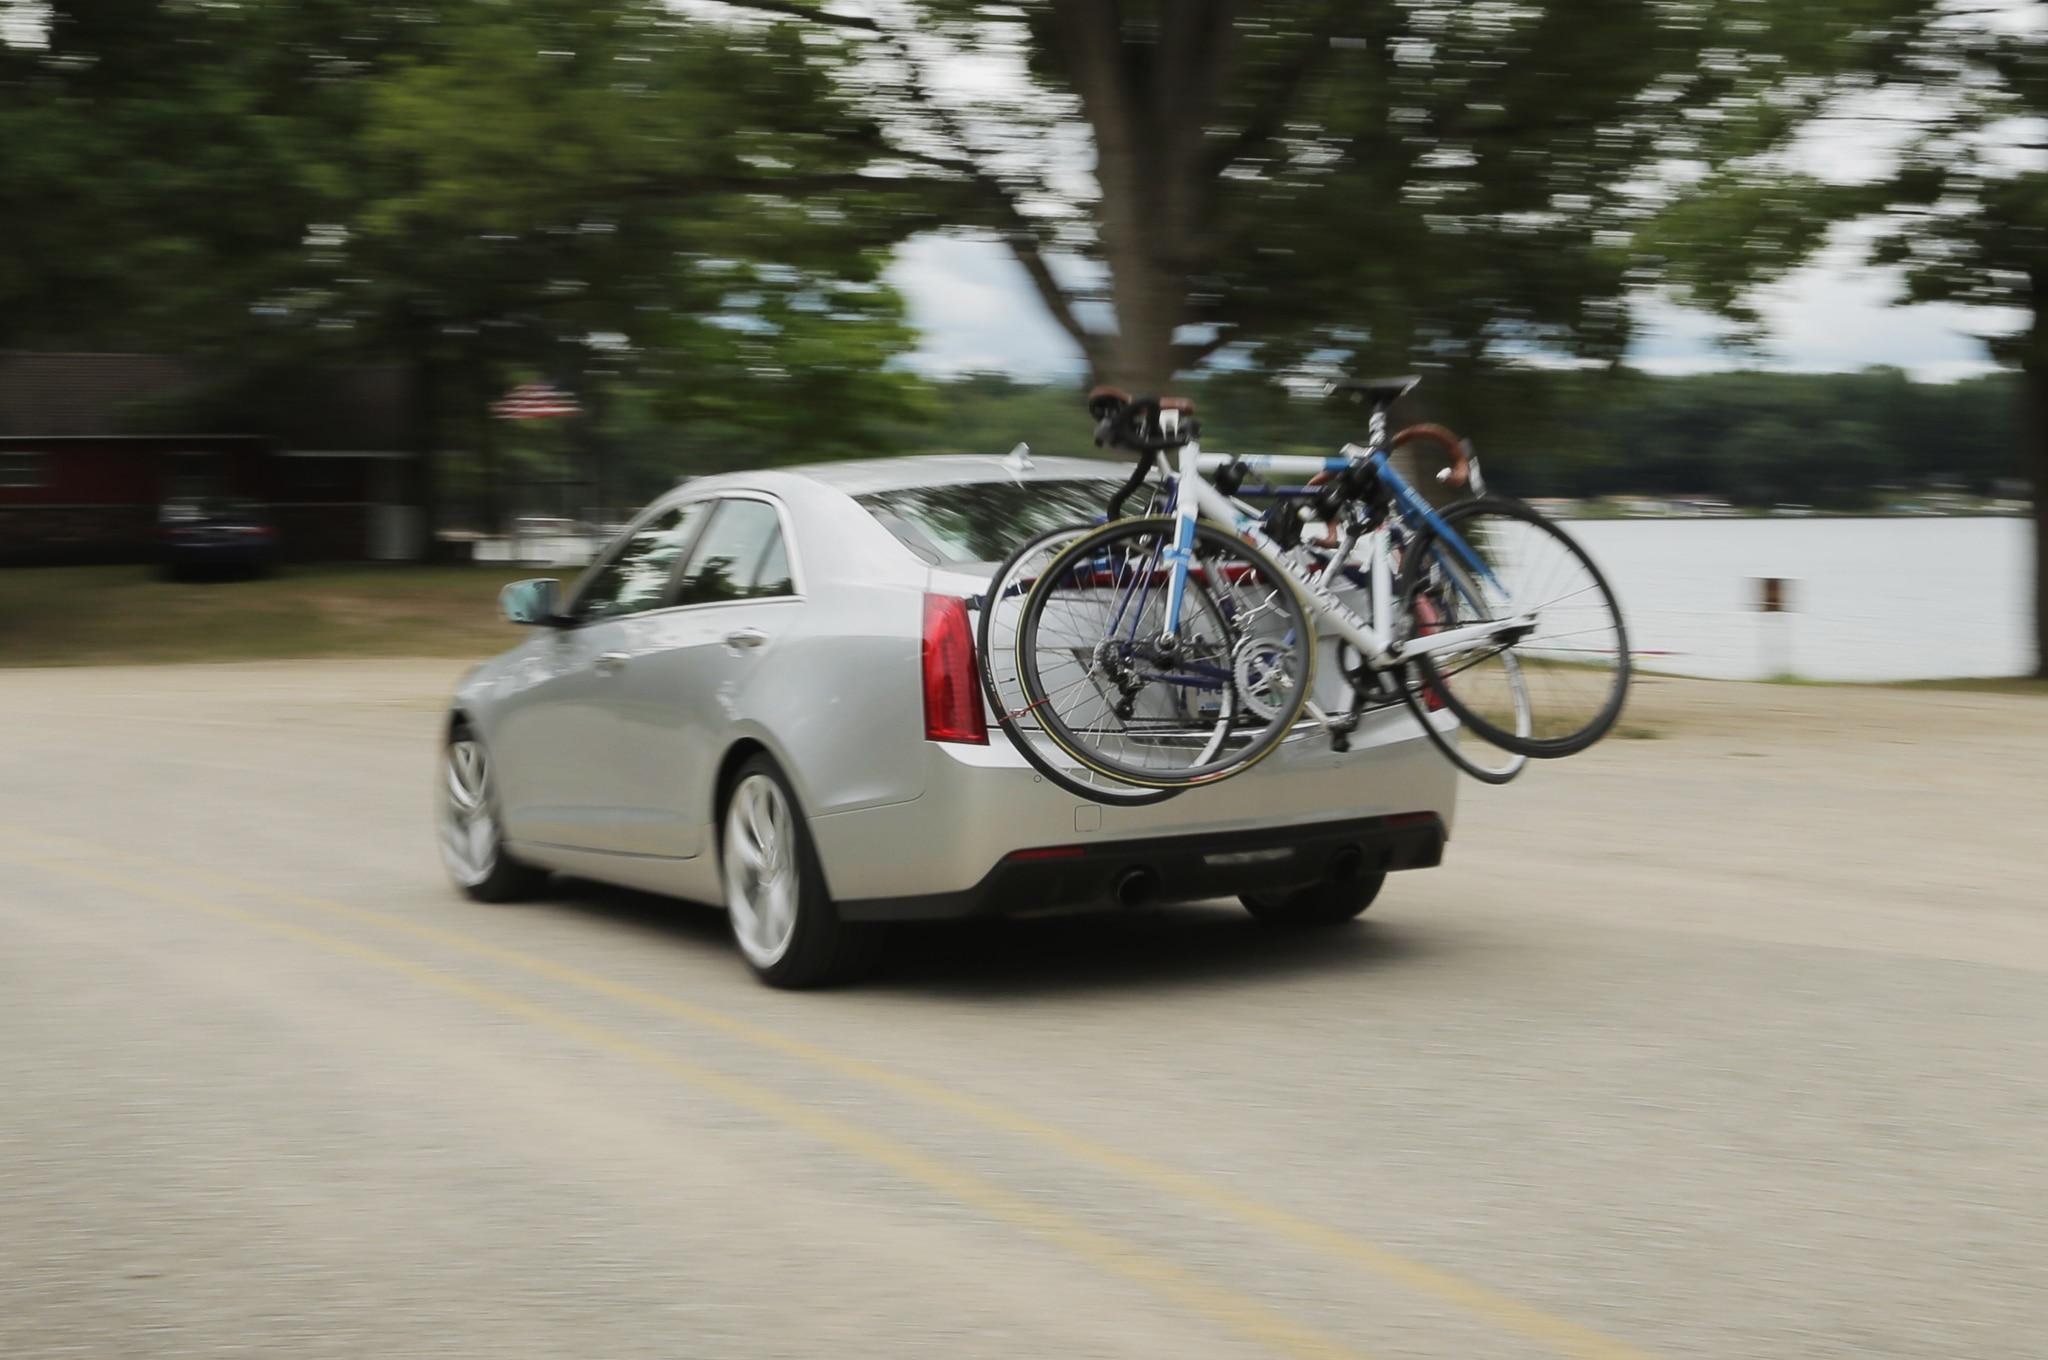 2013 Cadillac Ats Rear Three Quarter Motion Bike Rack1